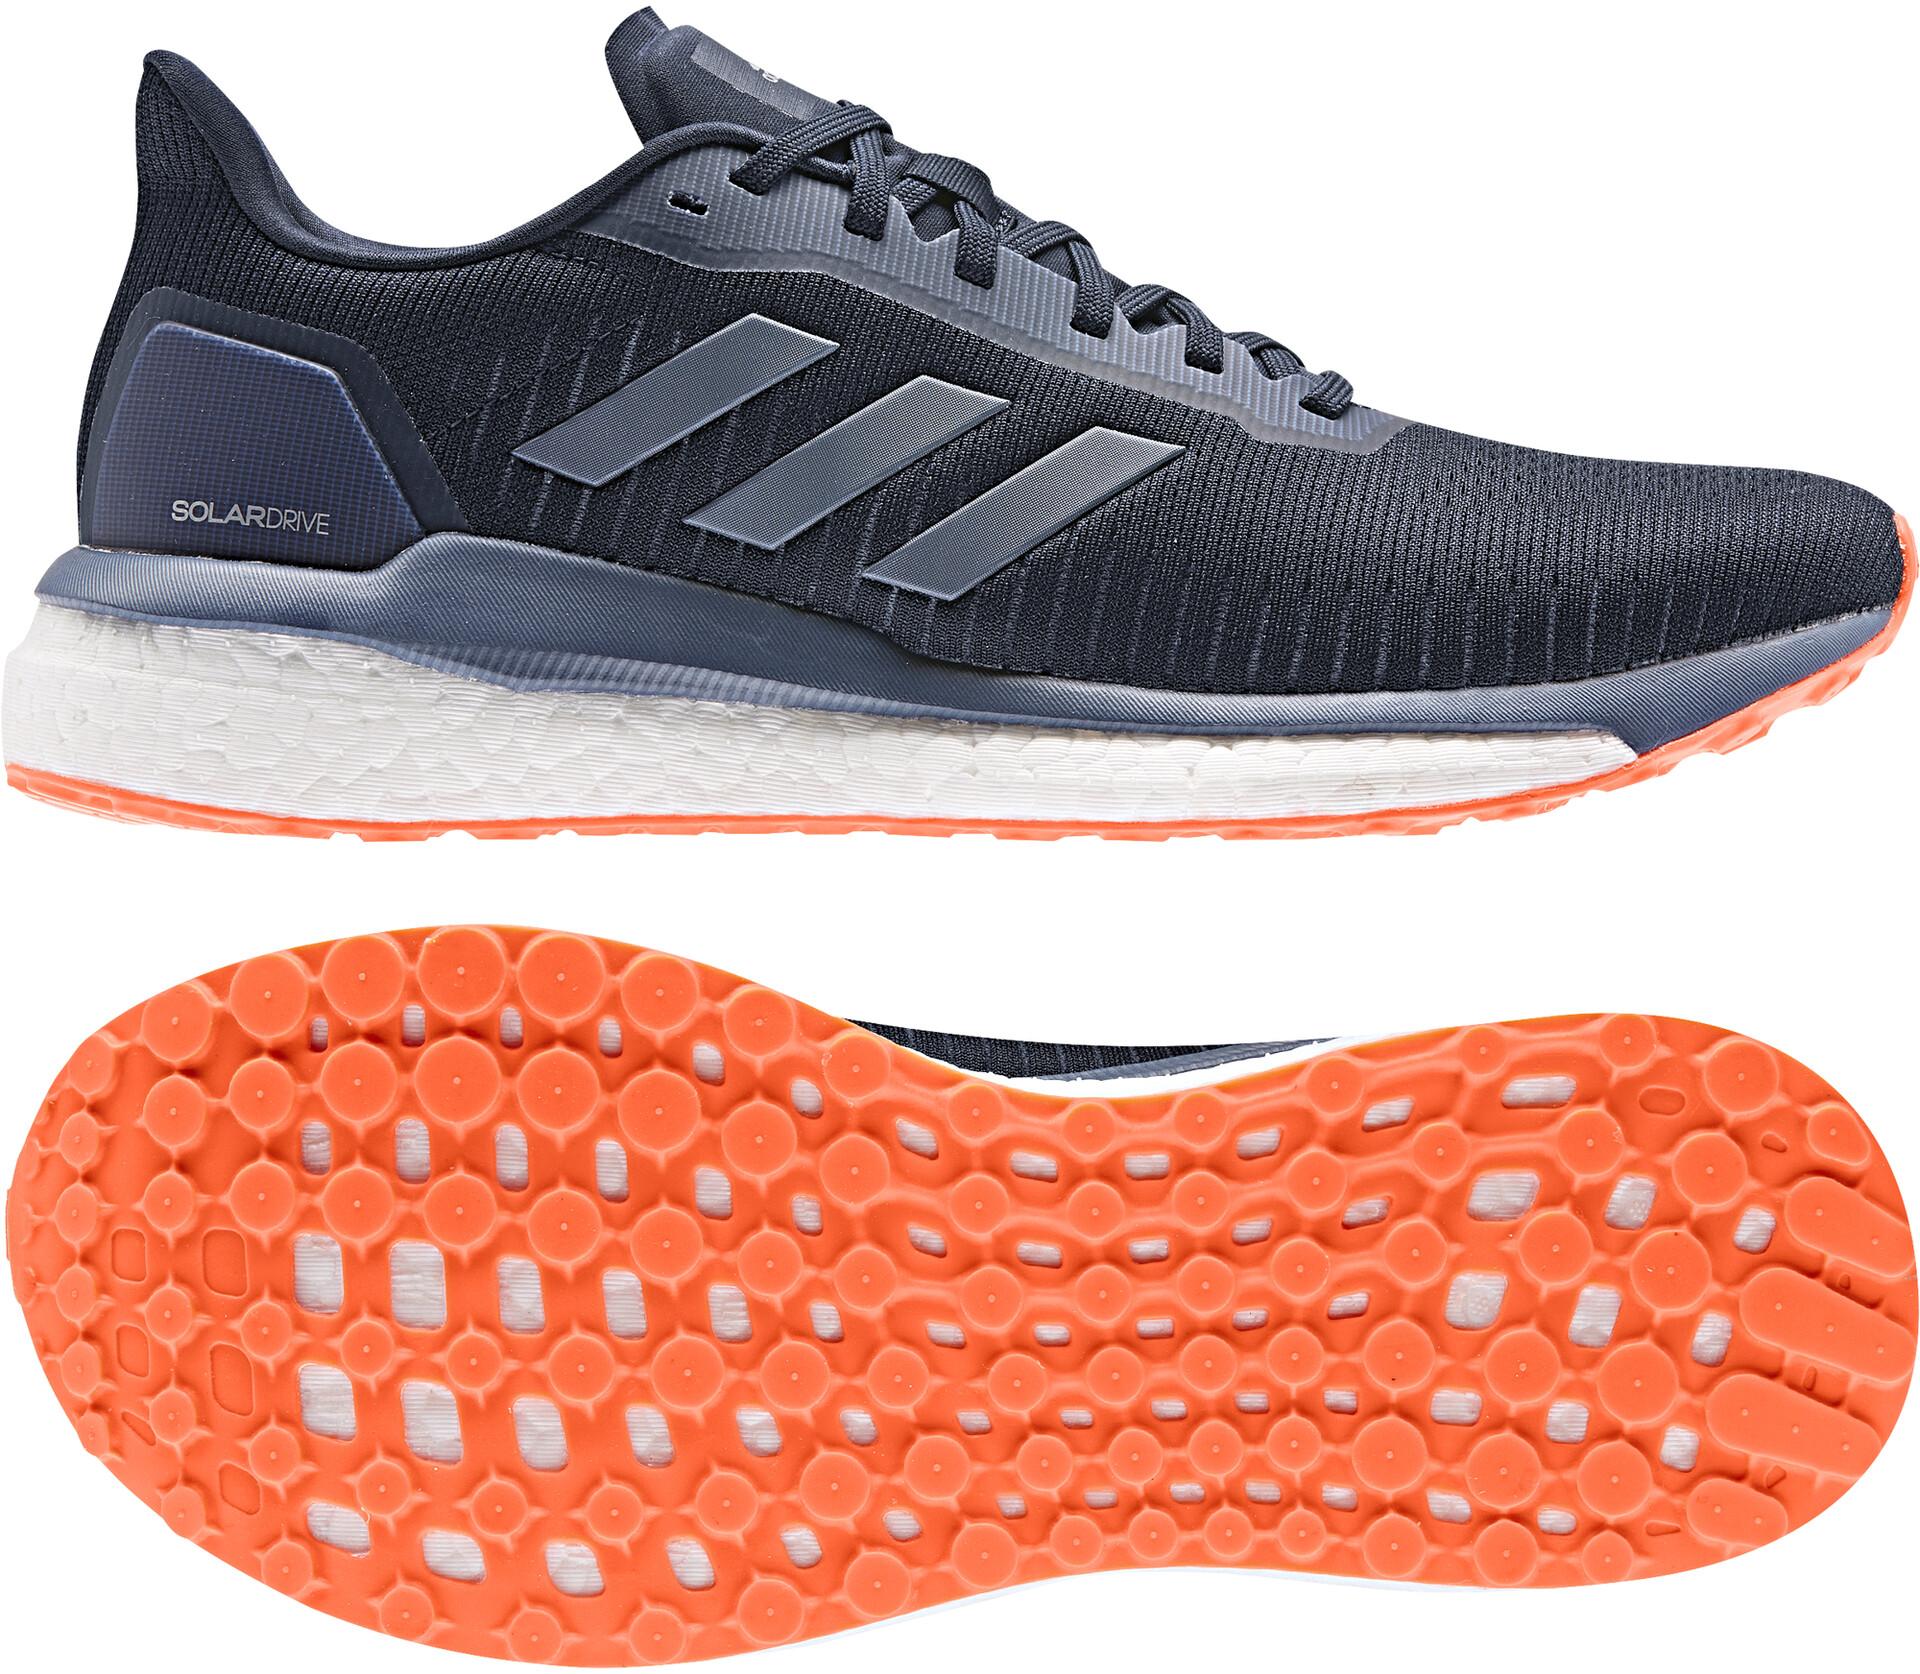 adidas Solar Drive 19 Low Cut Shoes Men collegiate navytech inksolar orange